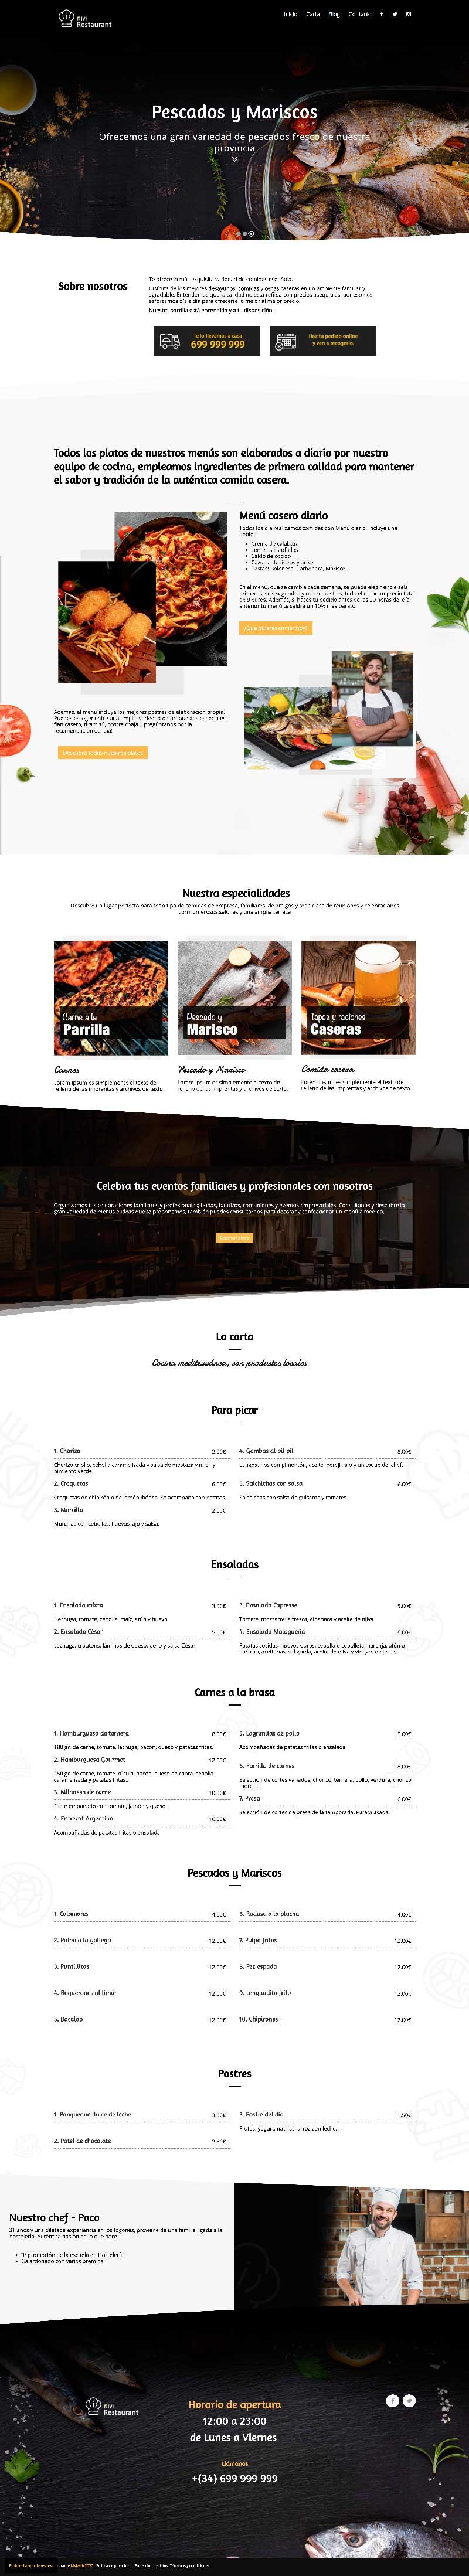 Plantilla web para restaurantes bares Wordpress